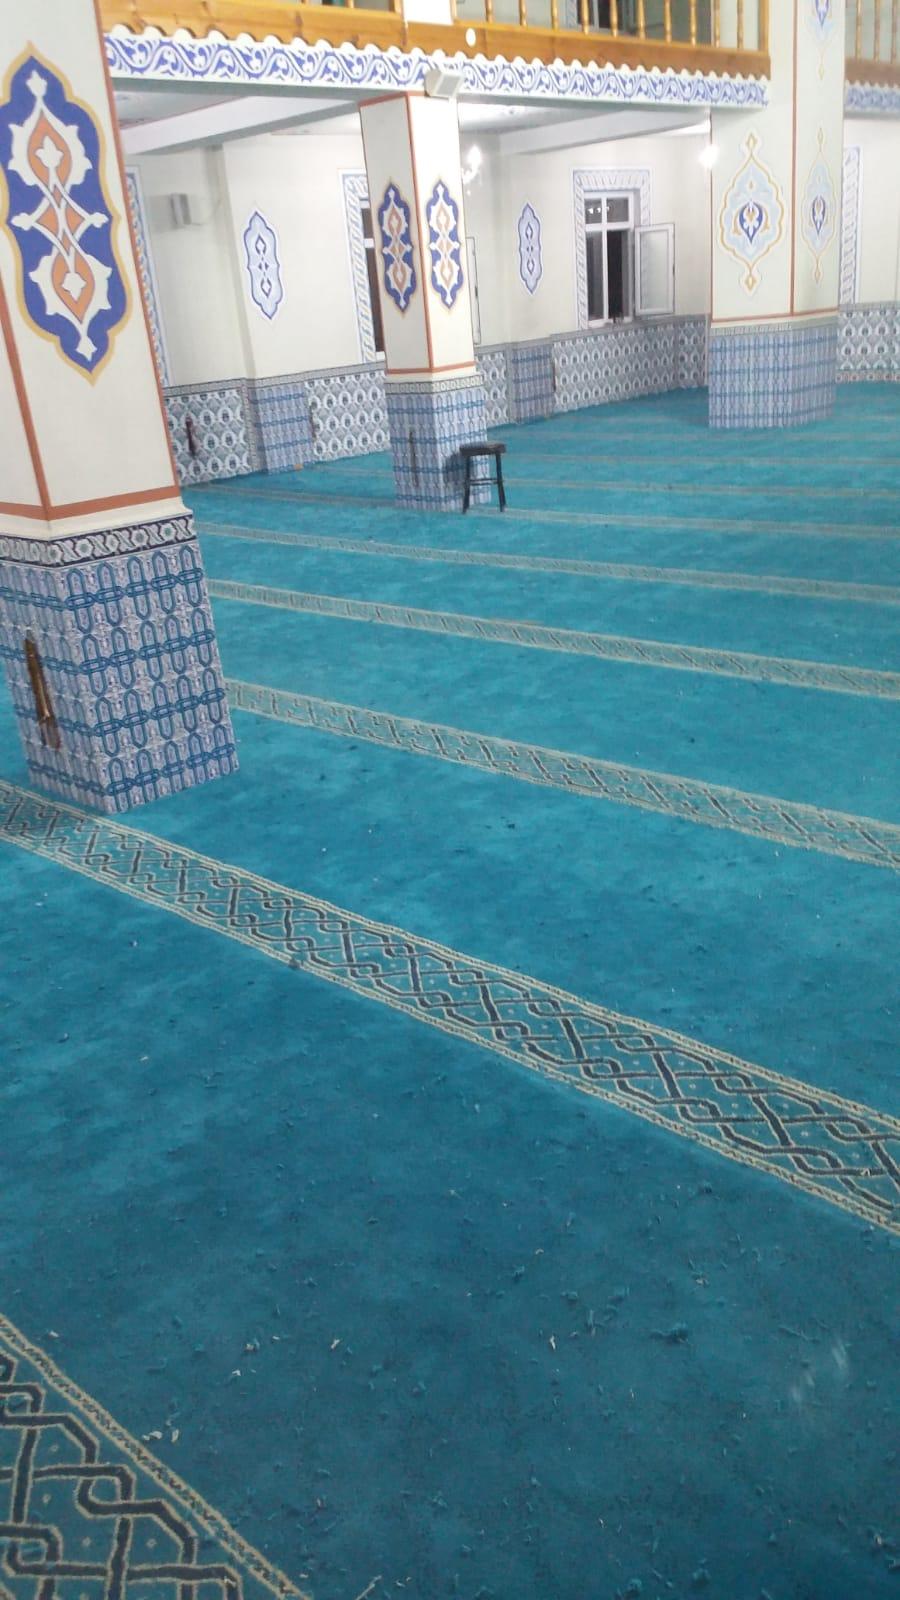 İstanbul Sultanbeyli Dede Paşa Cami Halısı